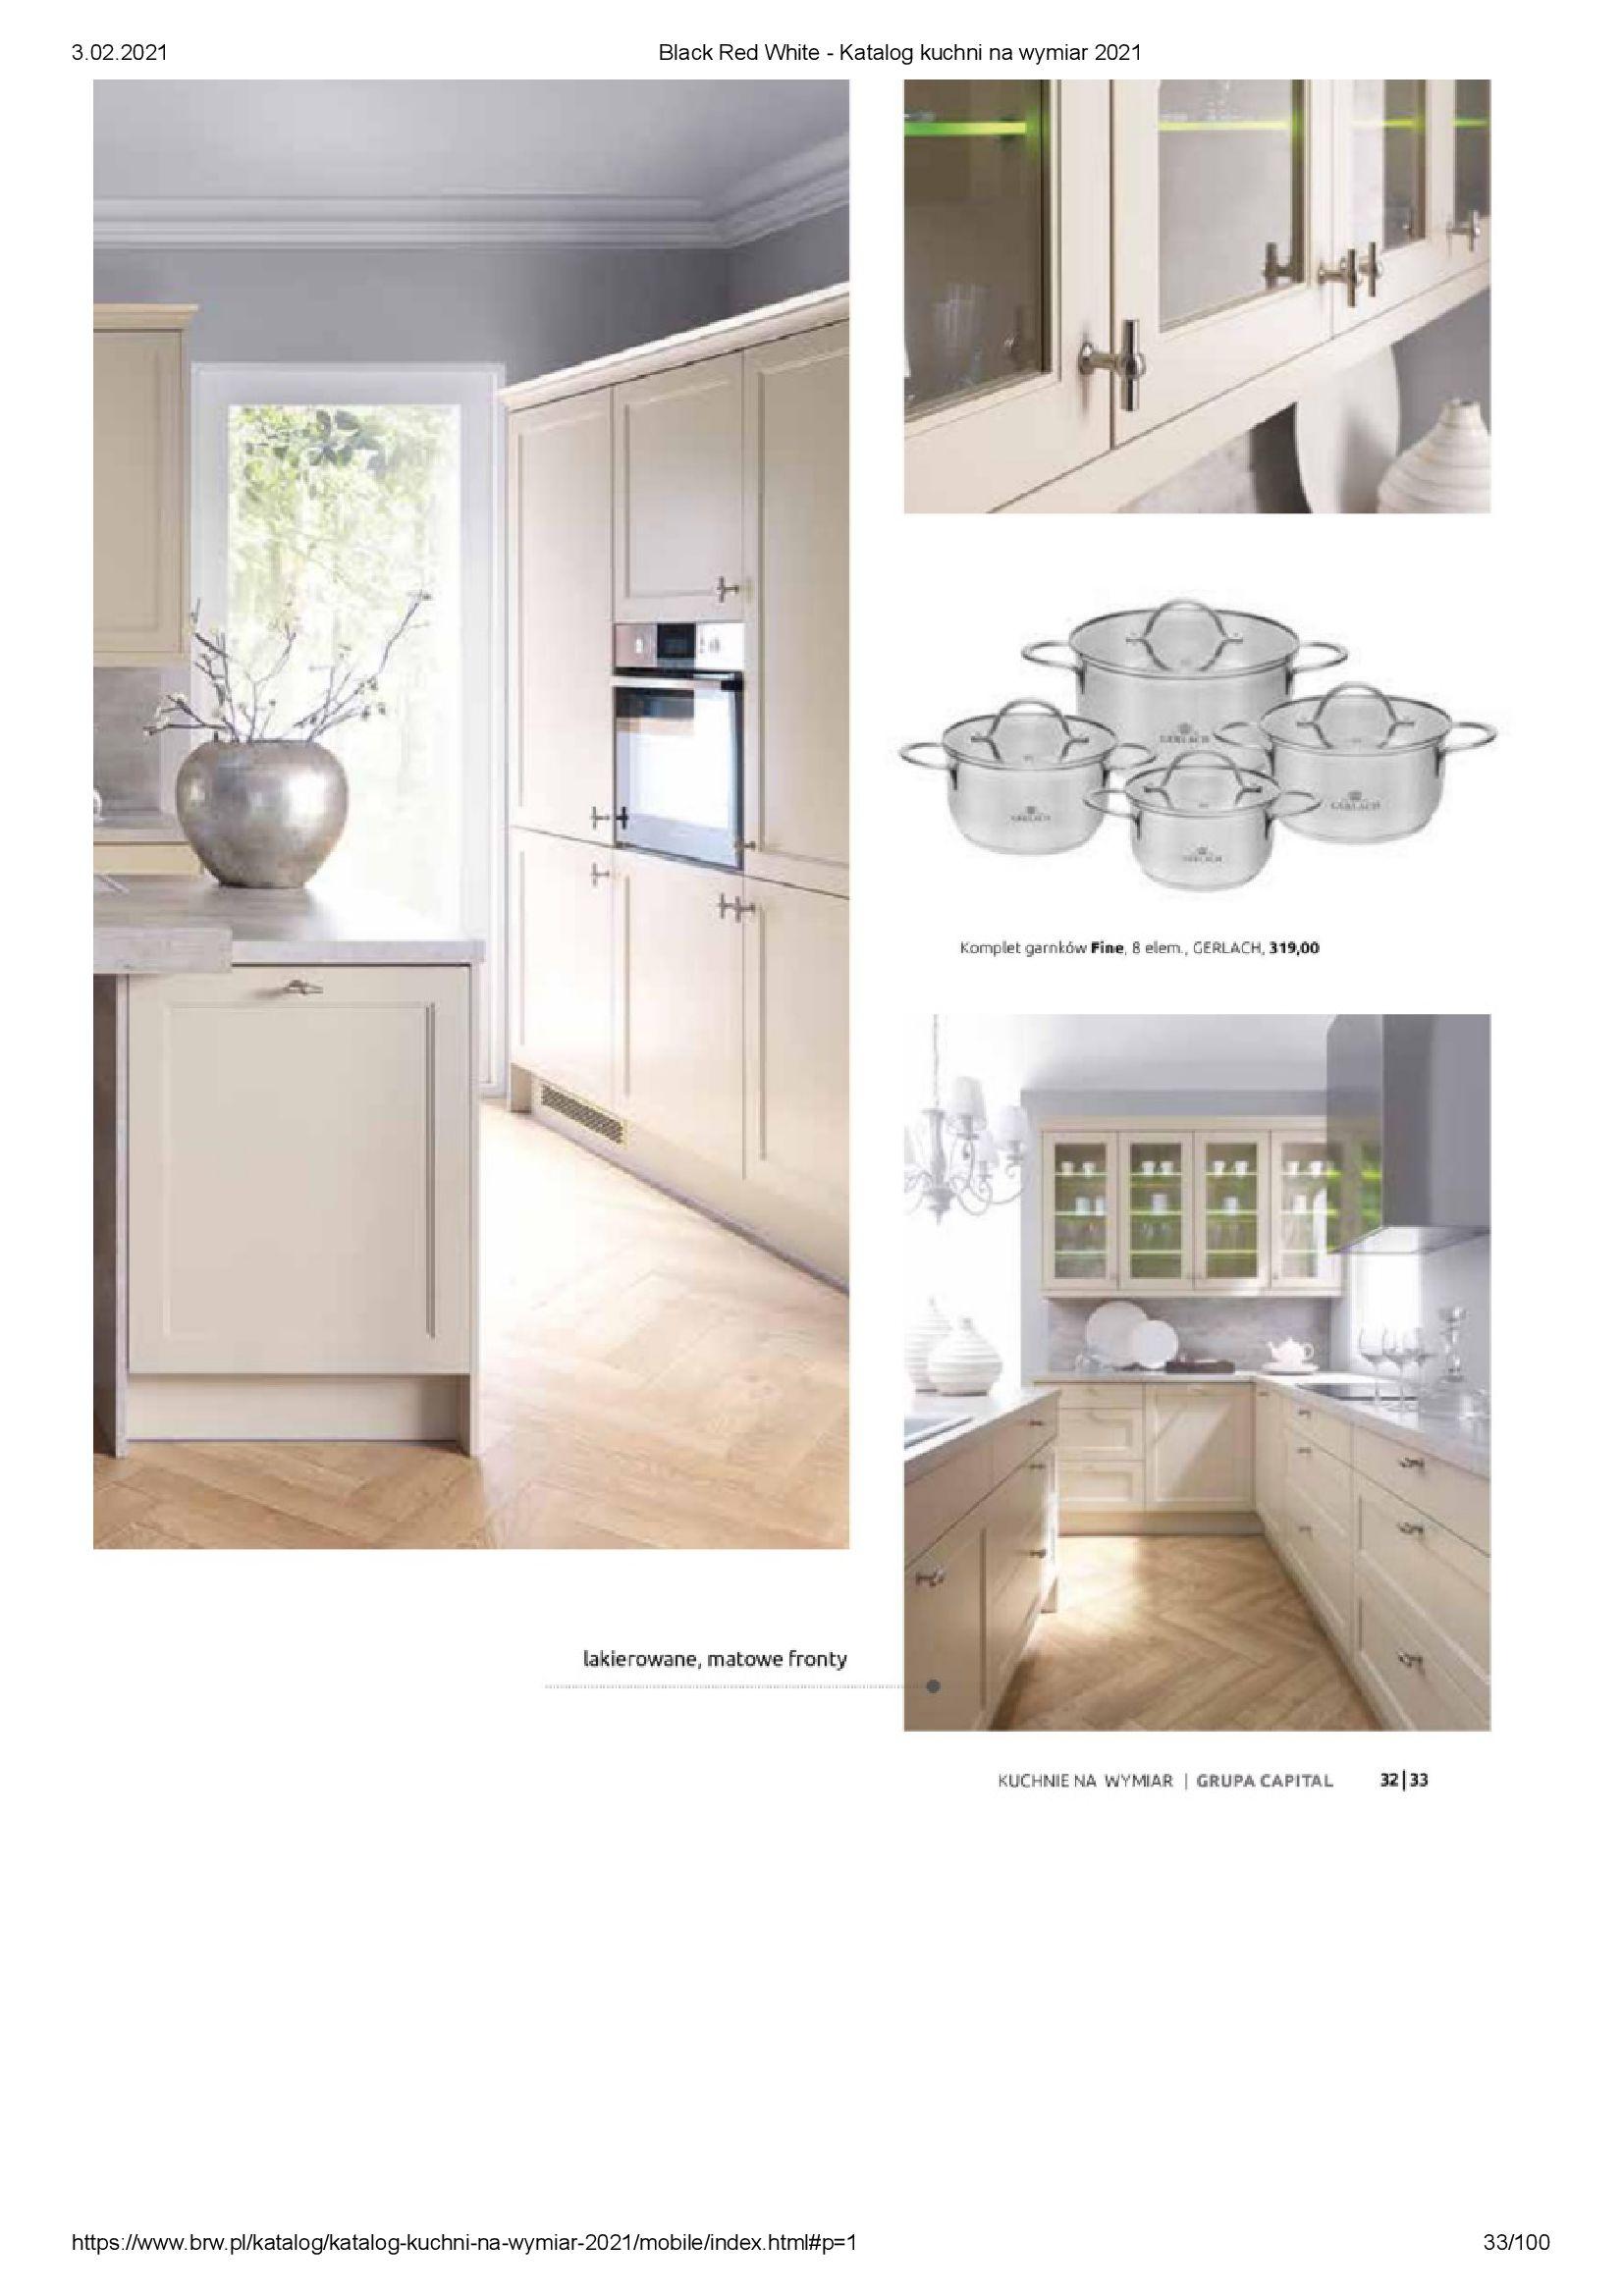 Gazetka Black Red White: Katalog - Kuchnie na wymiar Senso Kitchens 2021 2021-01-01 page-33